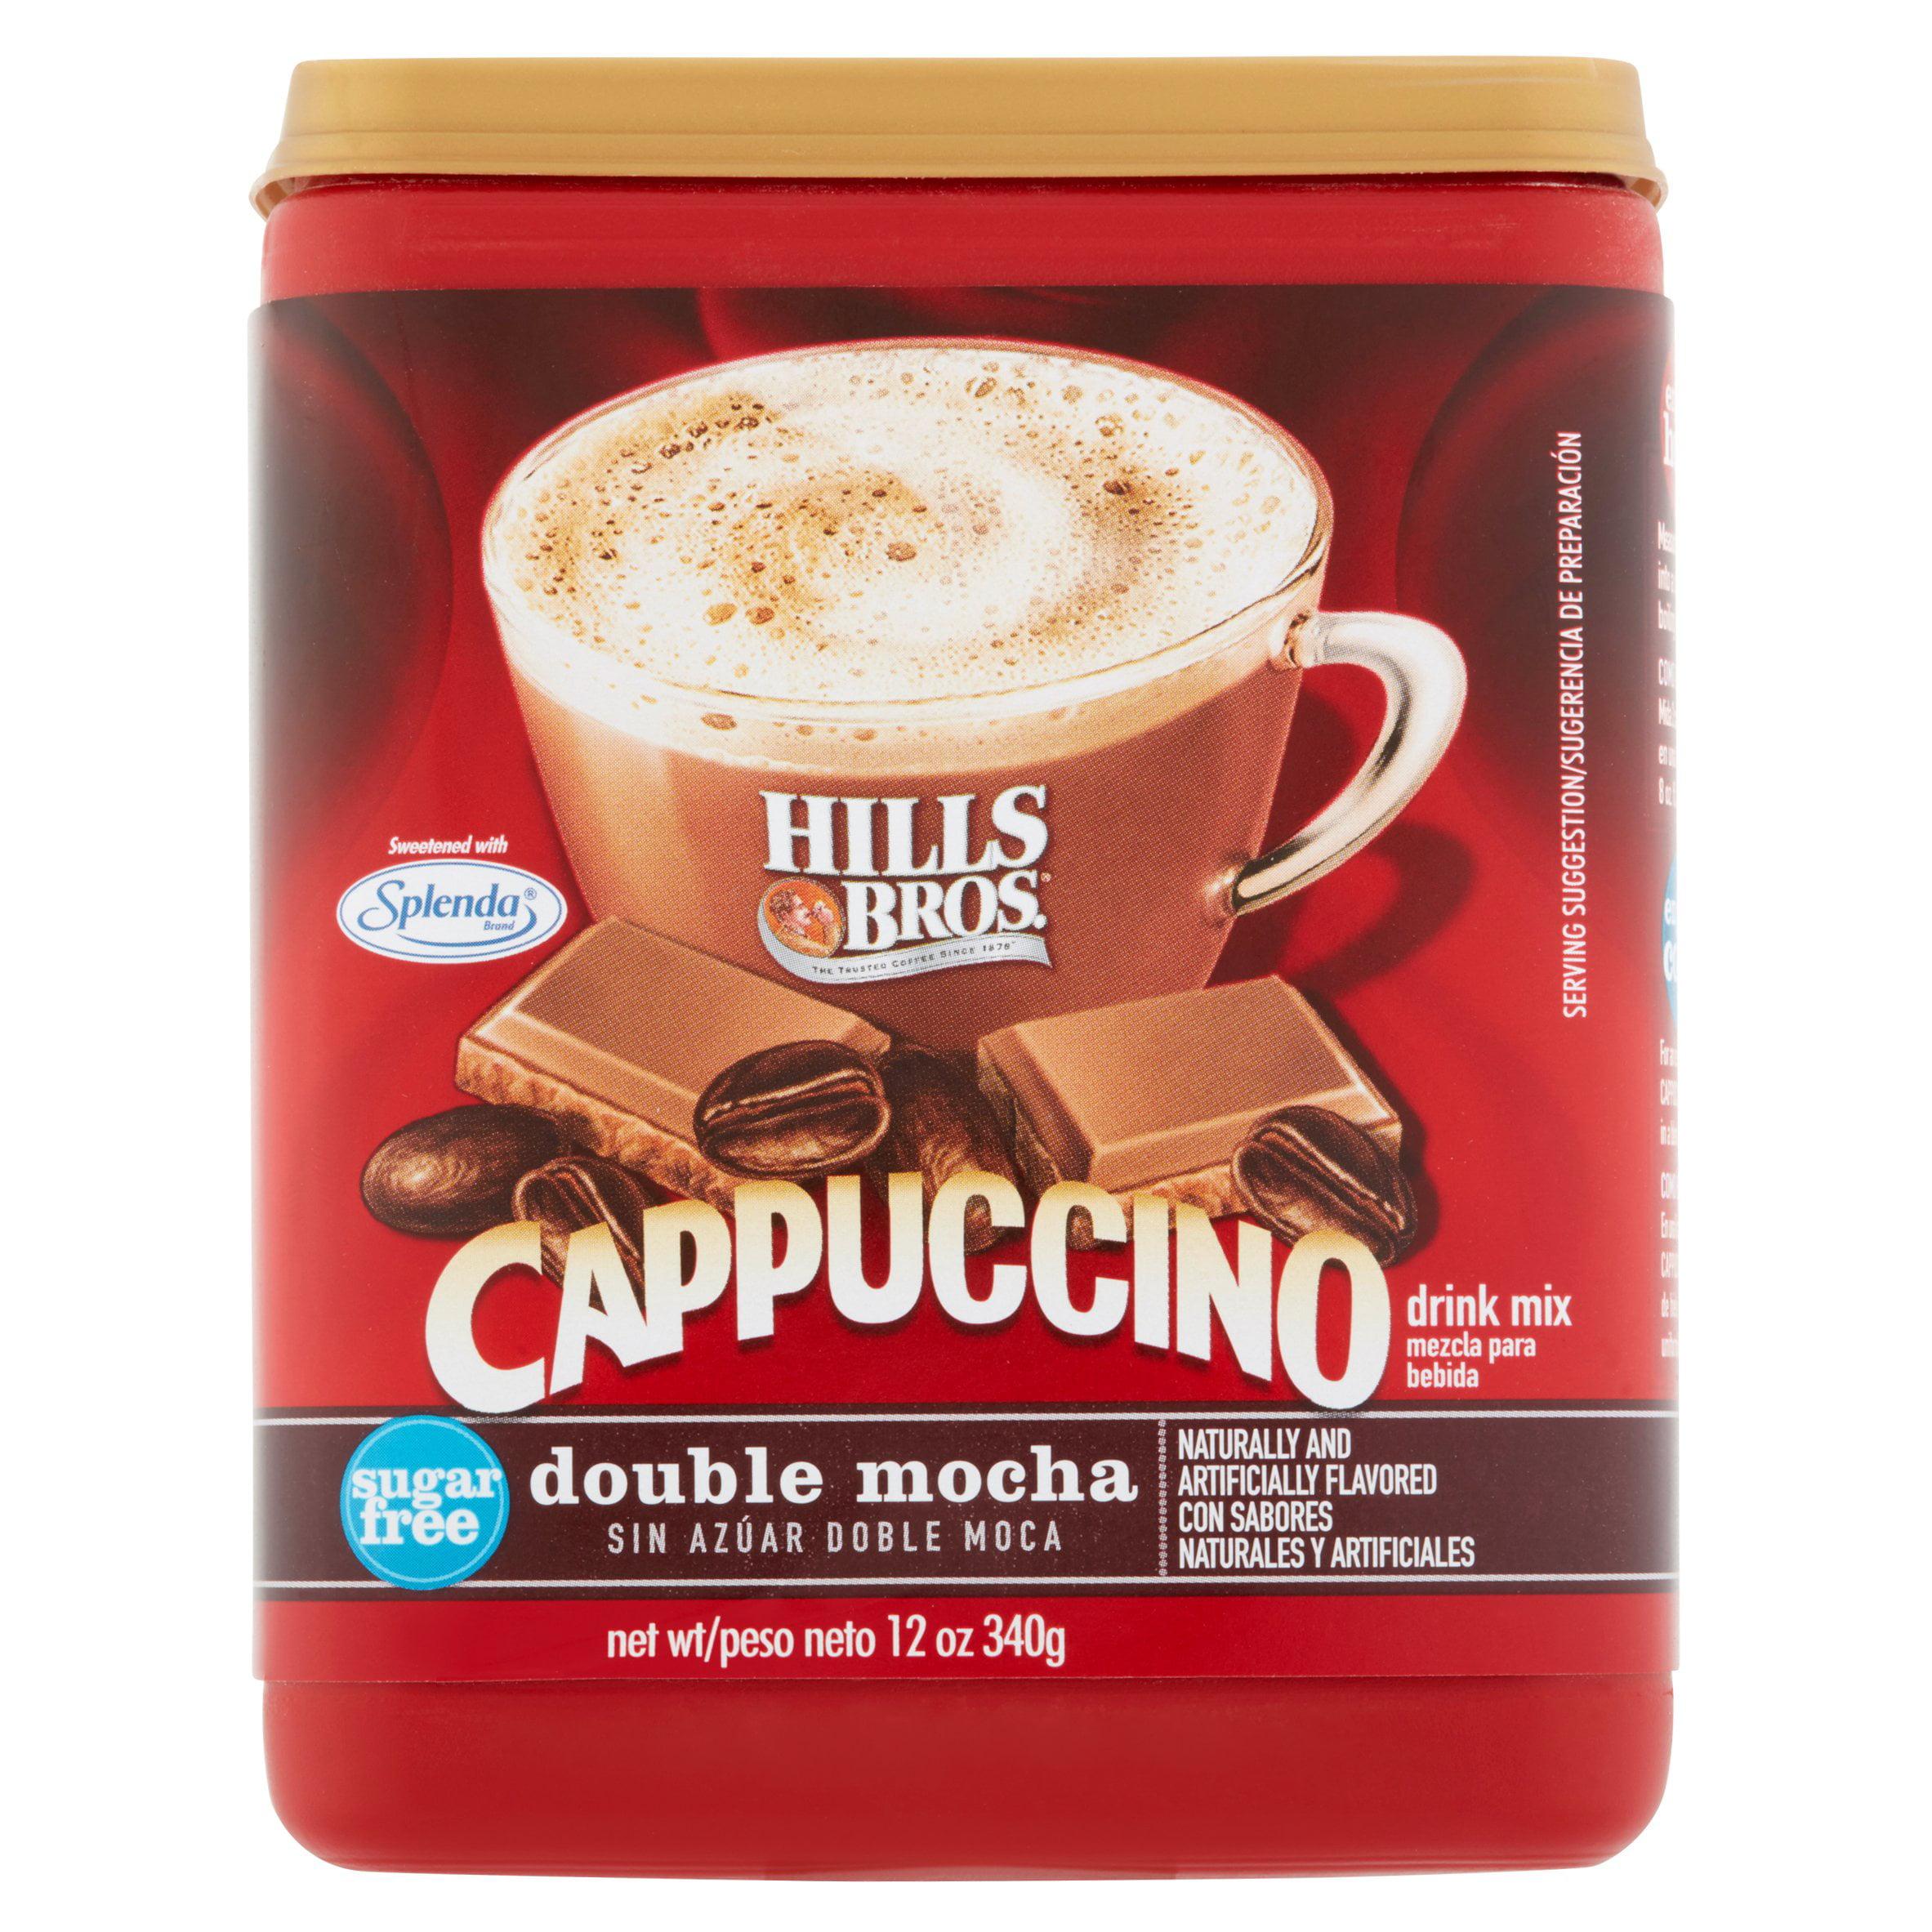 Hills Bros Sugar Free Double Mocha Cappuccino Beverage Mix, 12 oz ...